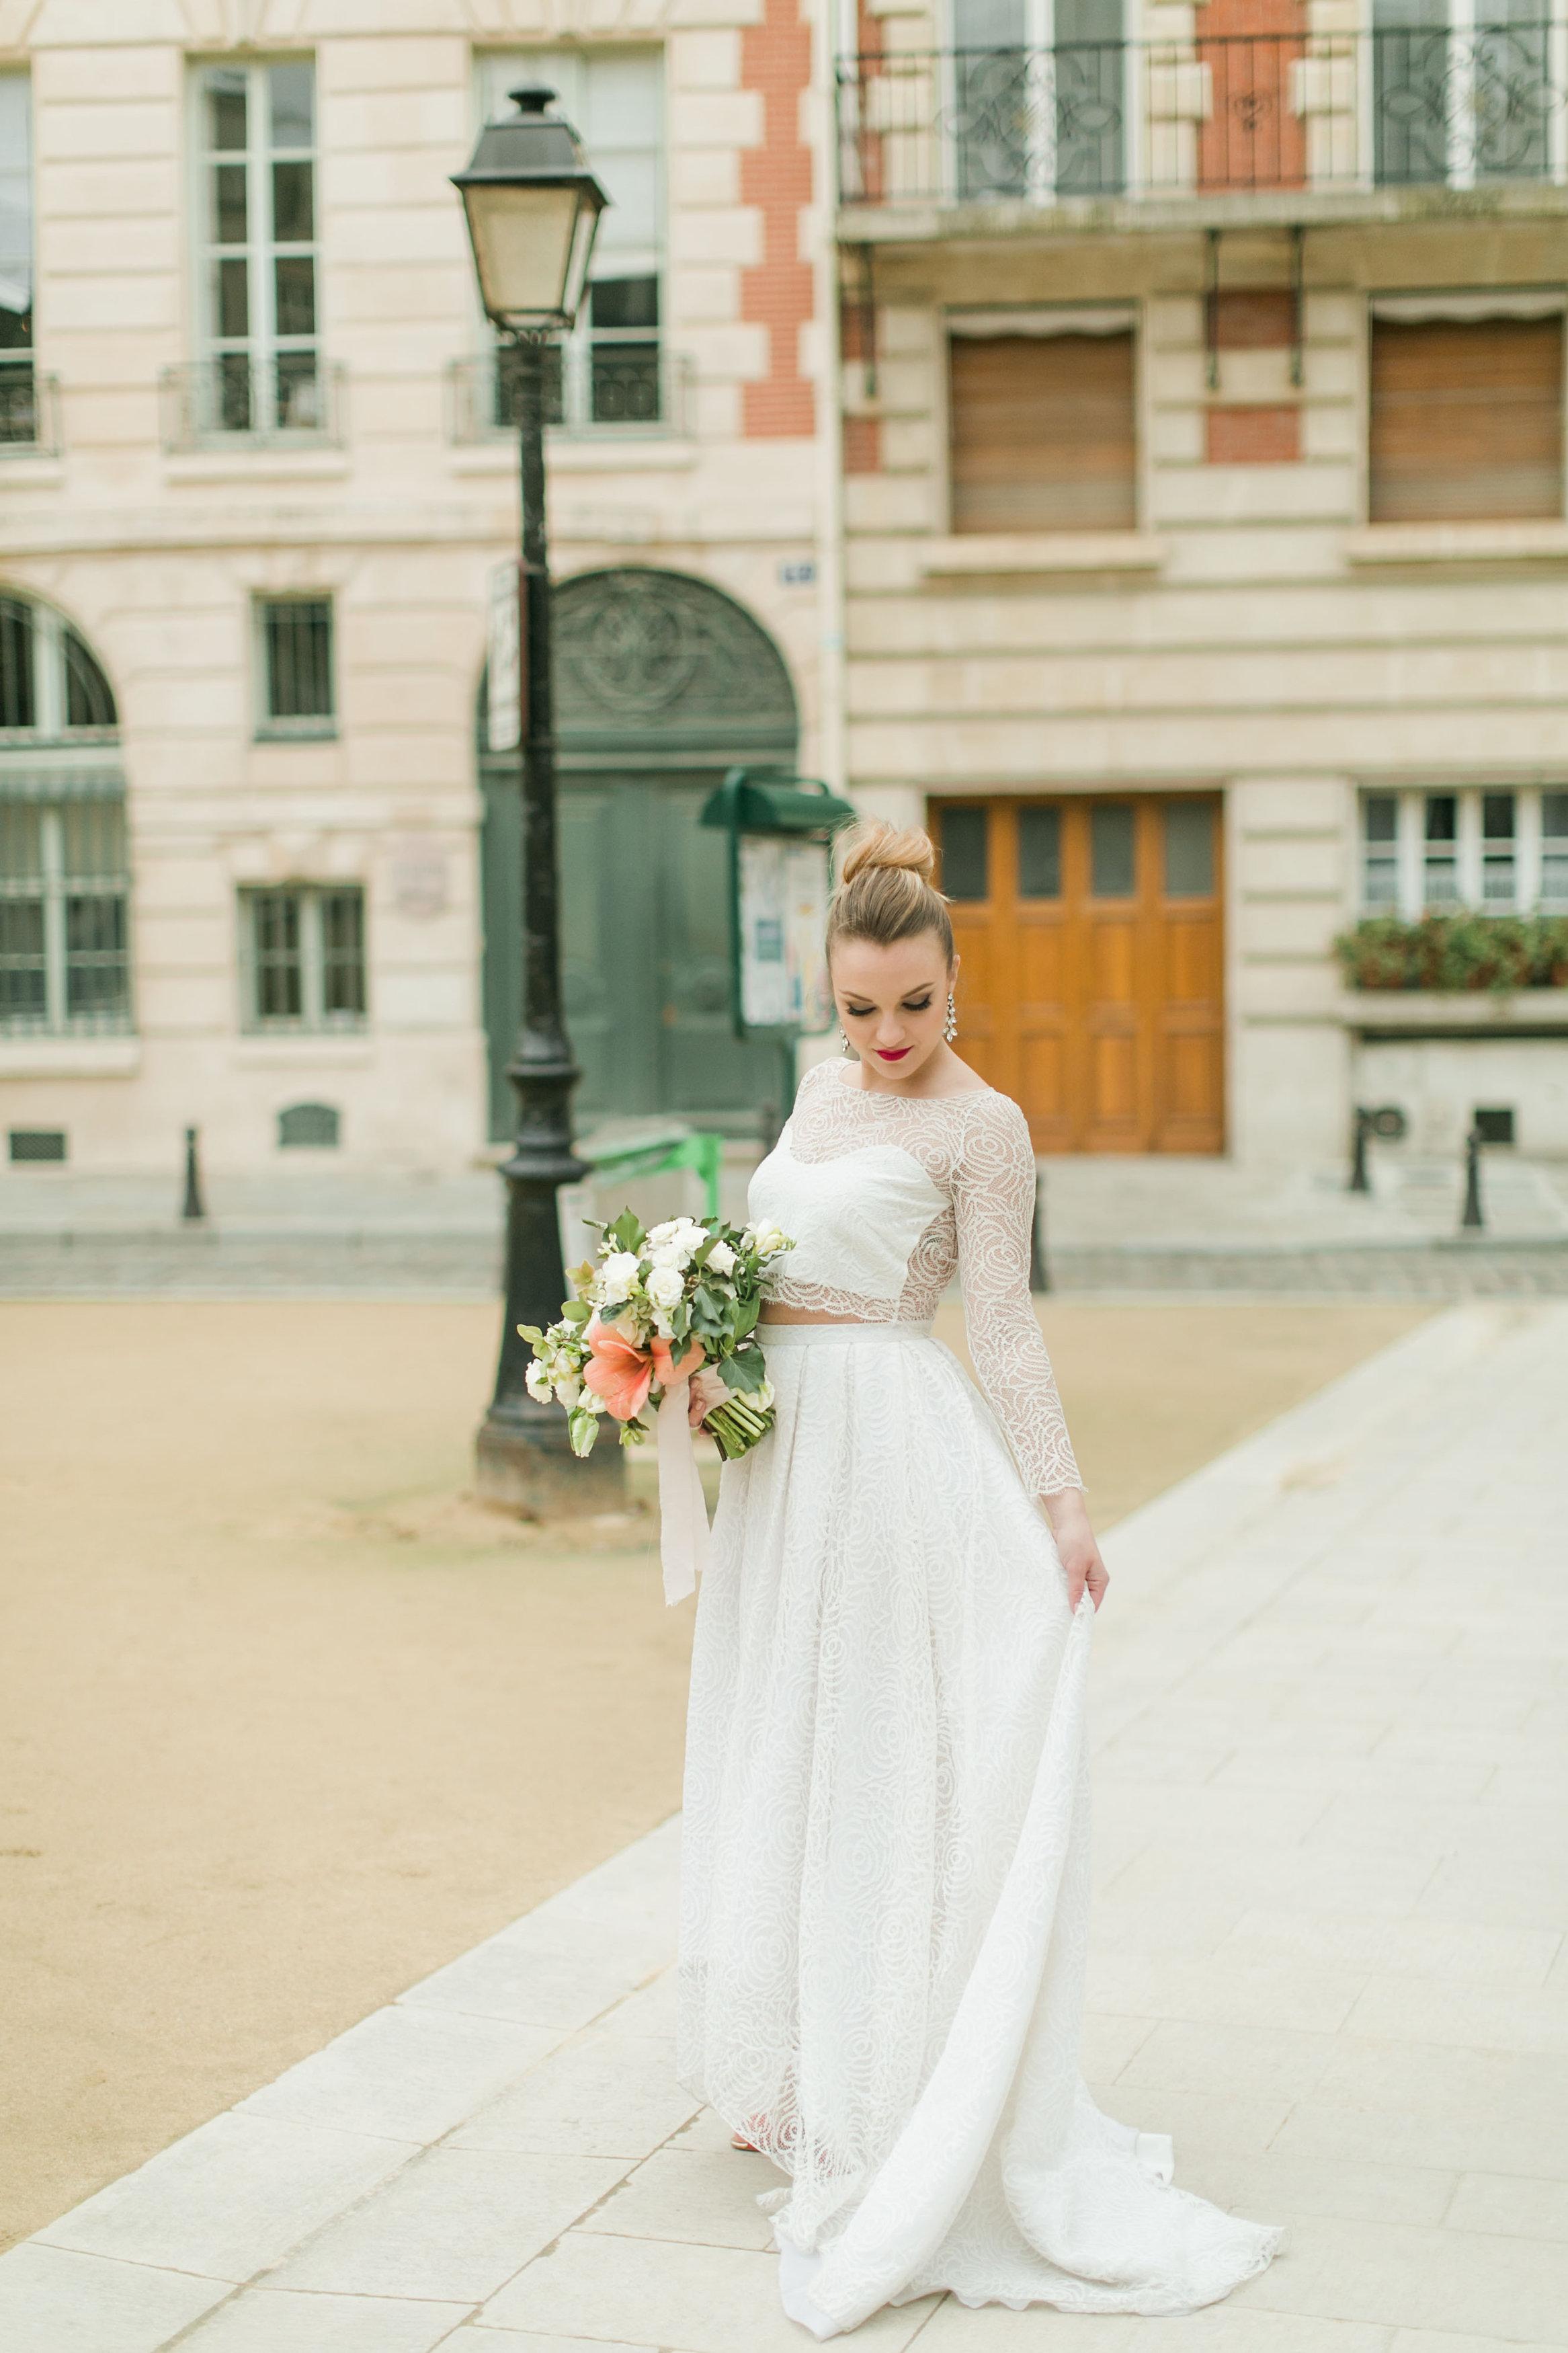 toronto-wedding-photographer-richelle-hunter-photography-new-york-paris-france-inspiration-45.jpg